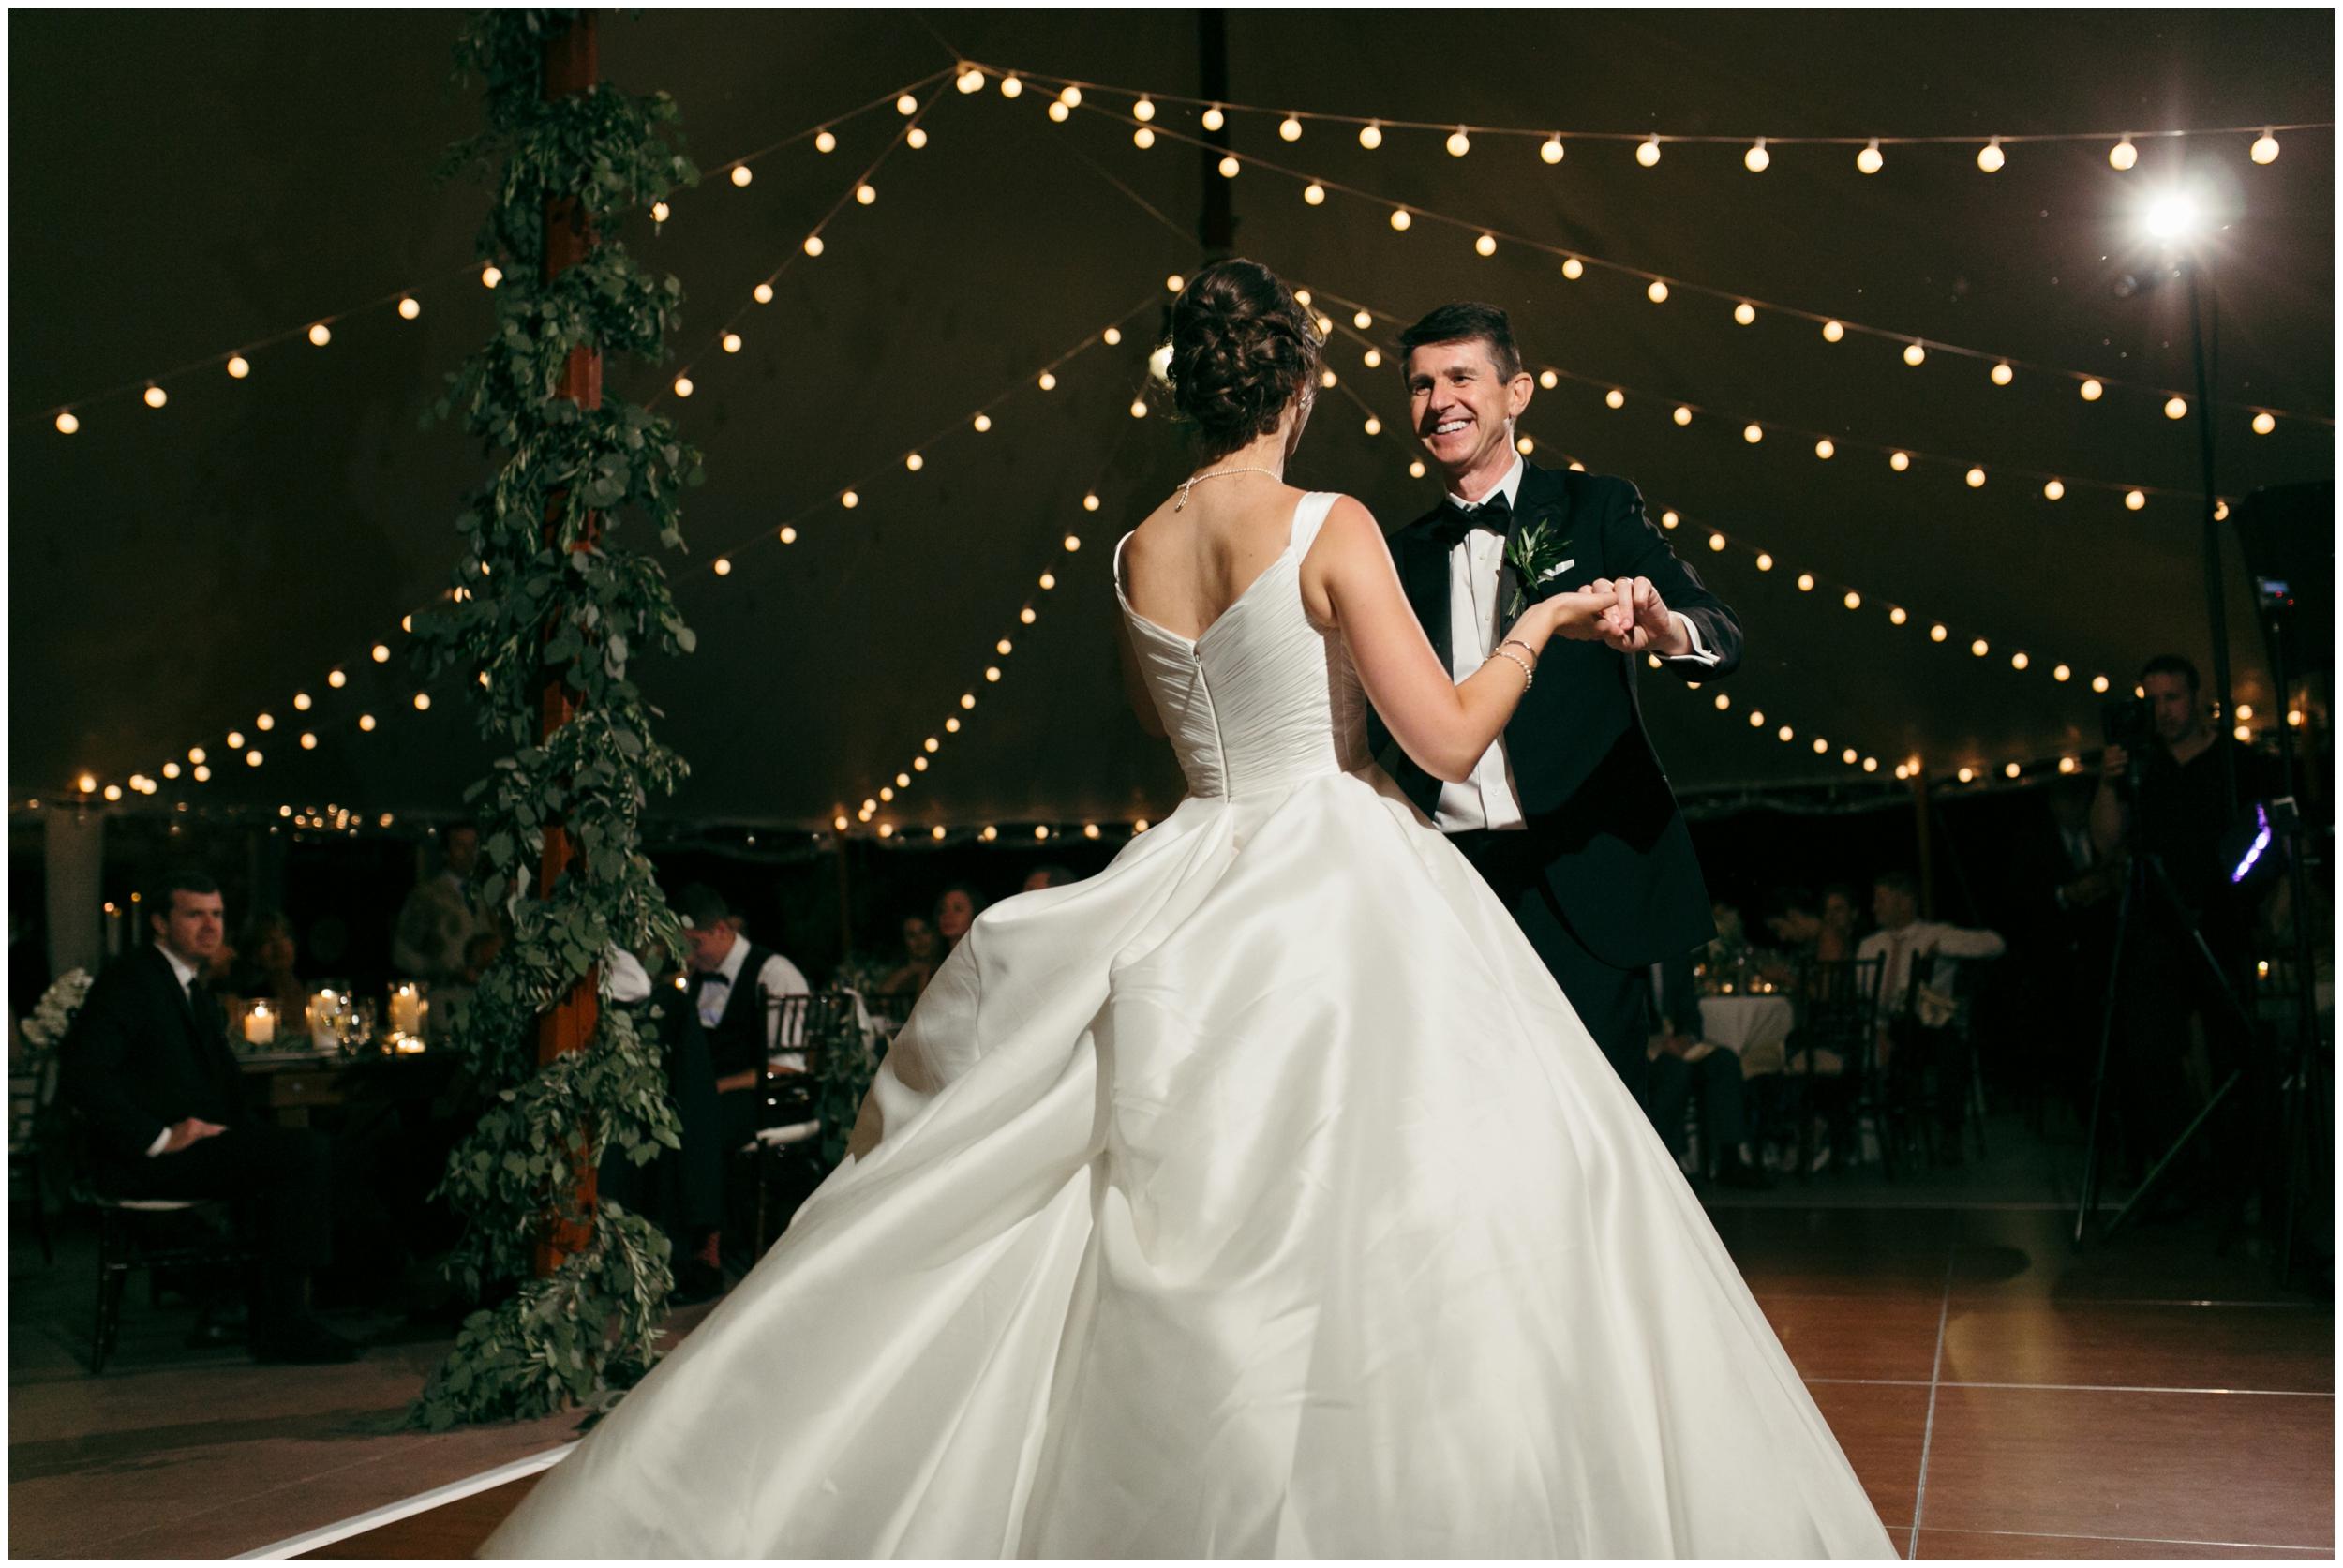 Willowdale-Estate-Wedding-Bailey-Q-Photo-Boston-Wedding-Photographer-099.JPG